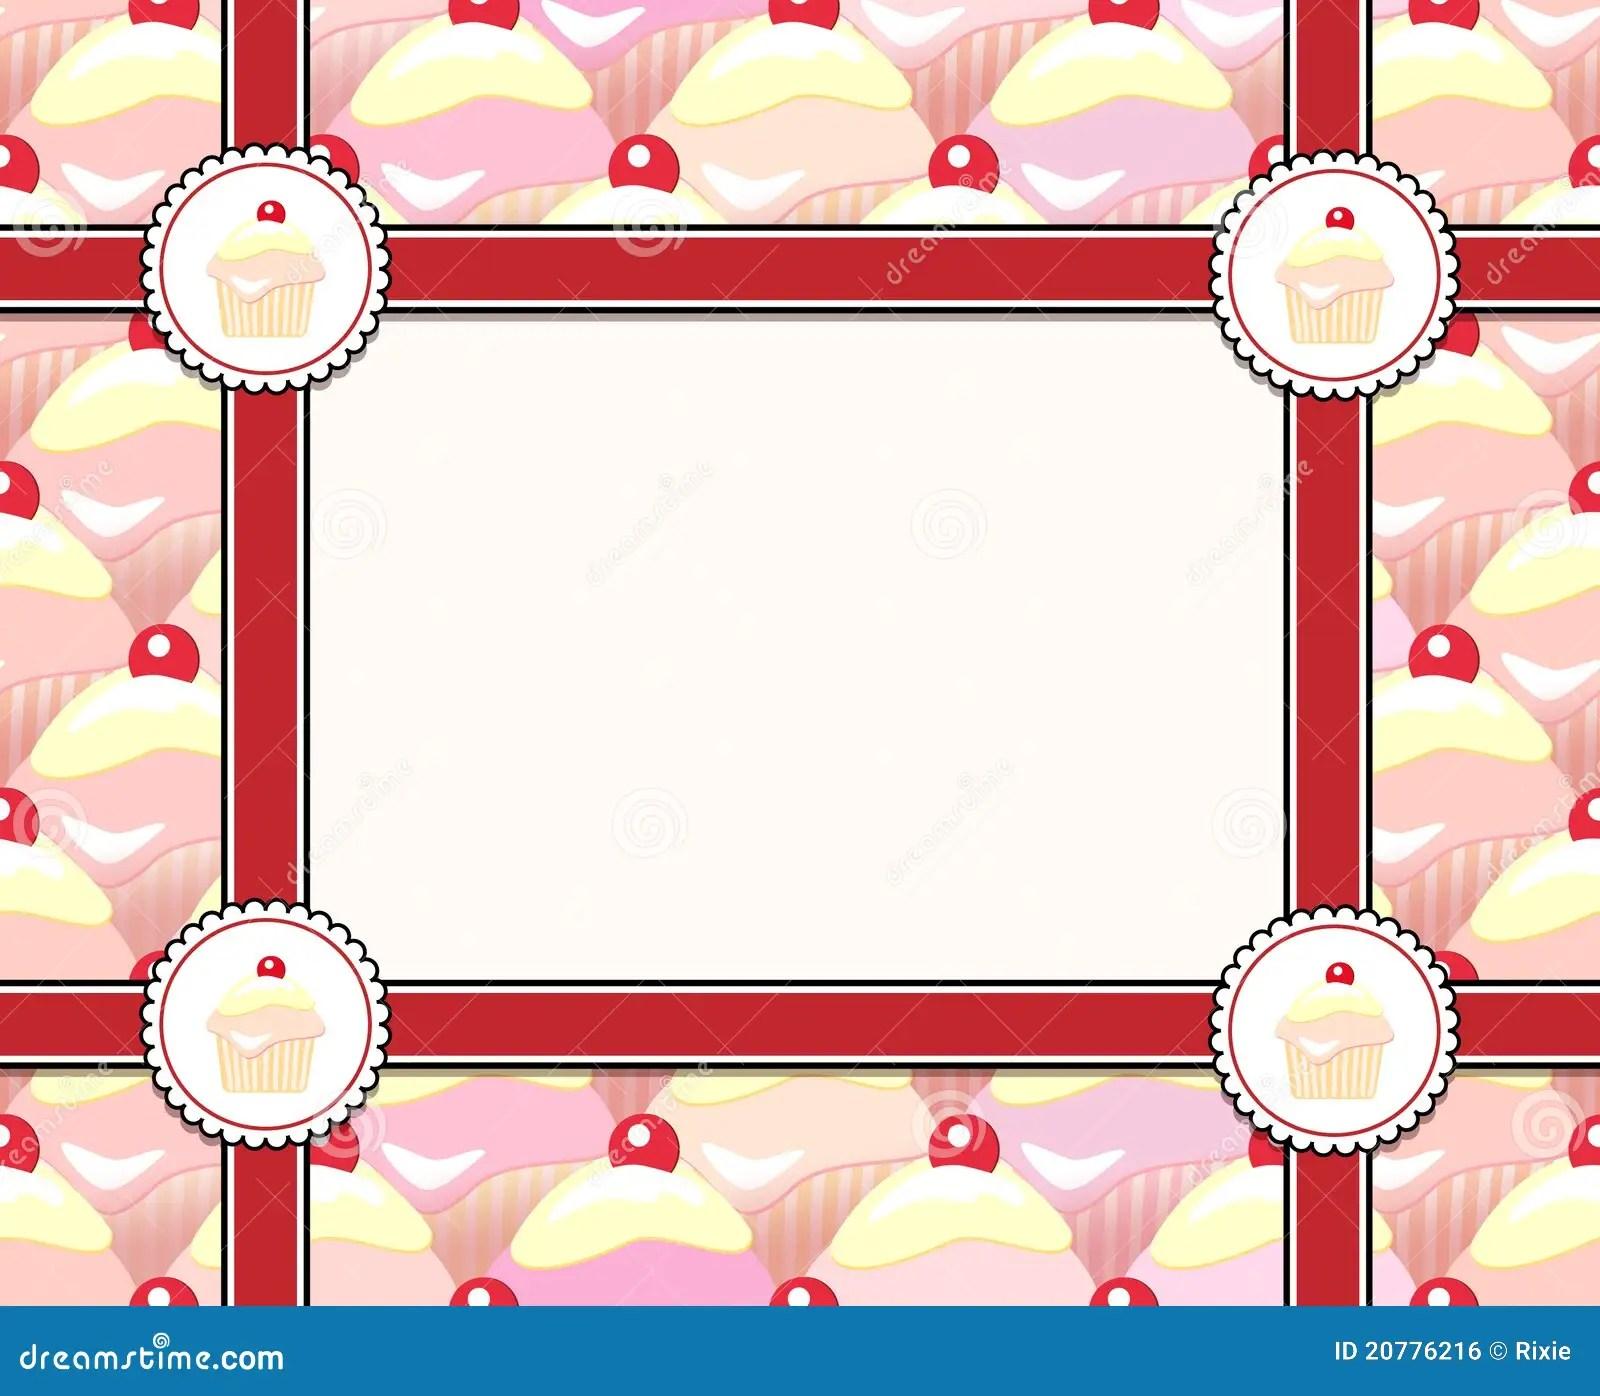 Cute Ribbons Wallpaper Cupcake Frame Royalty Free Stock Image Image 20776216